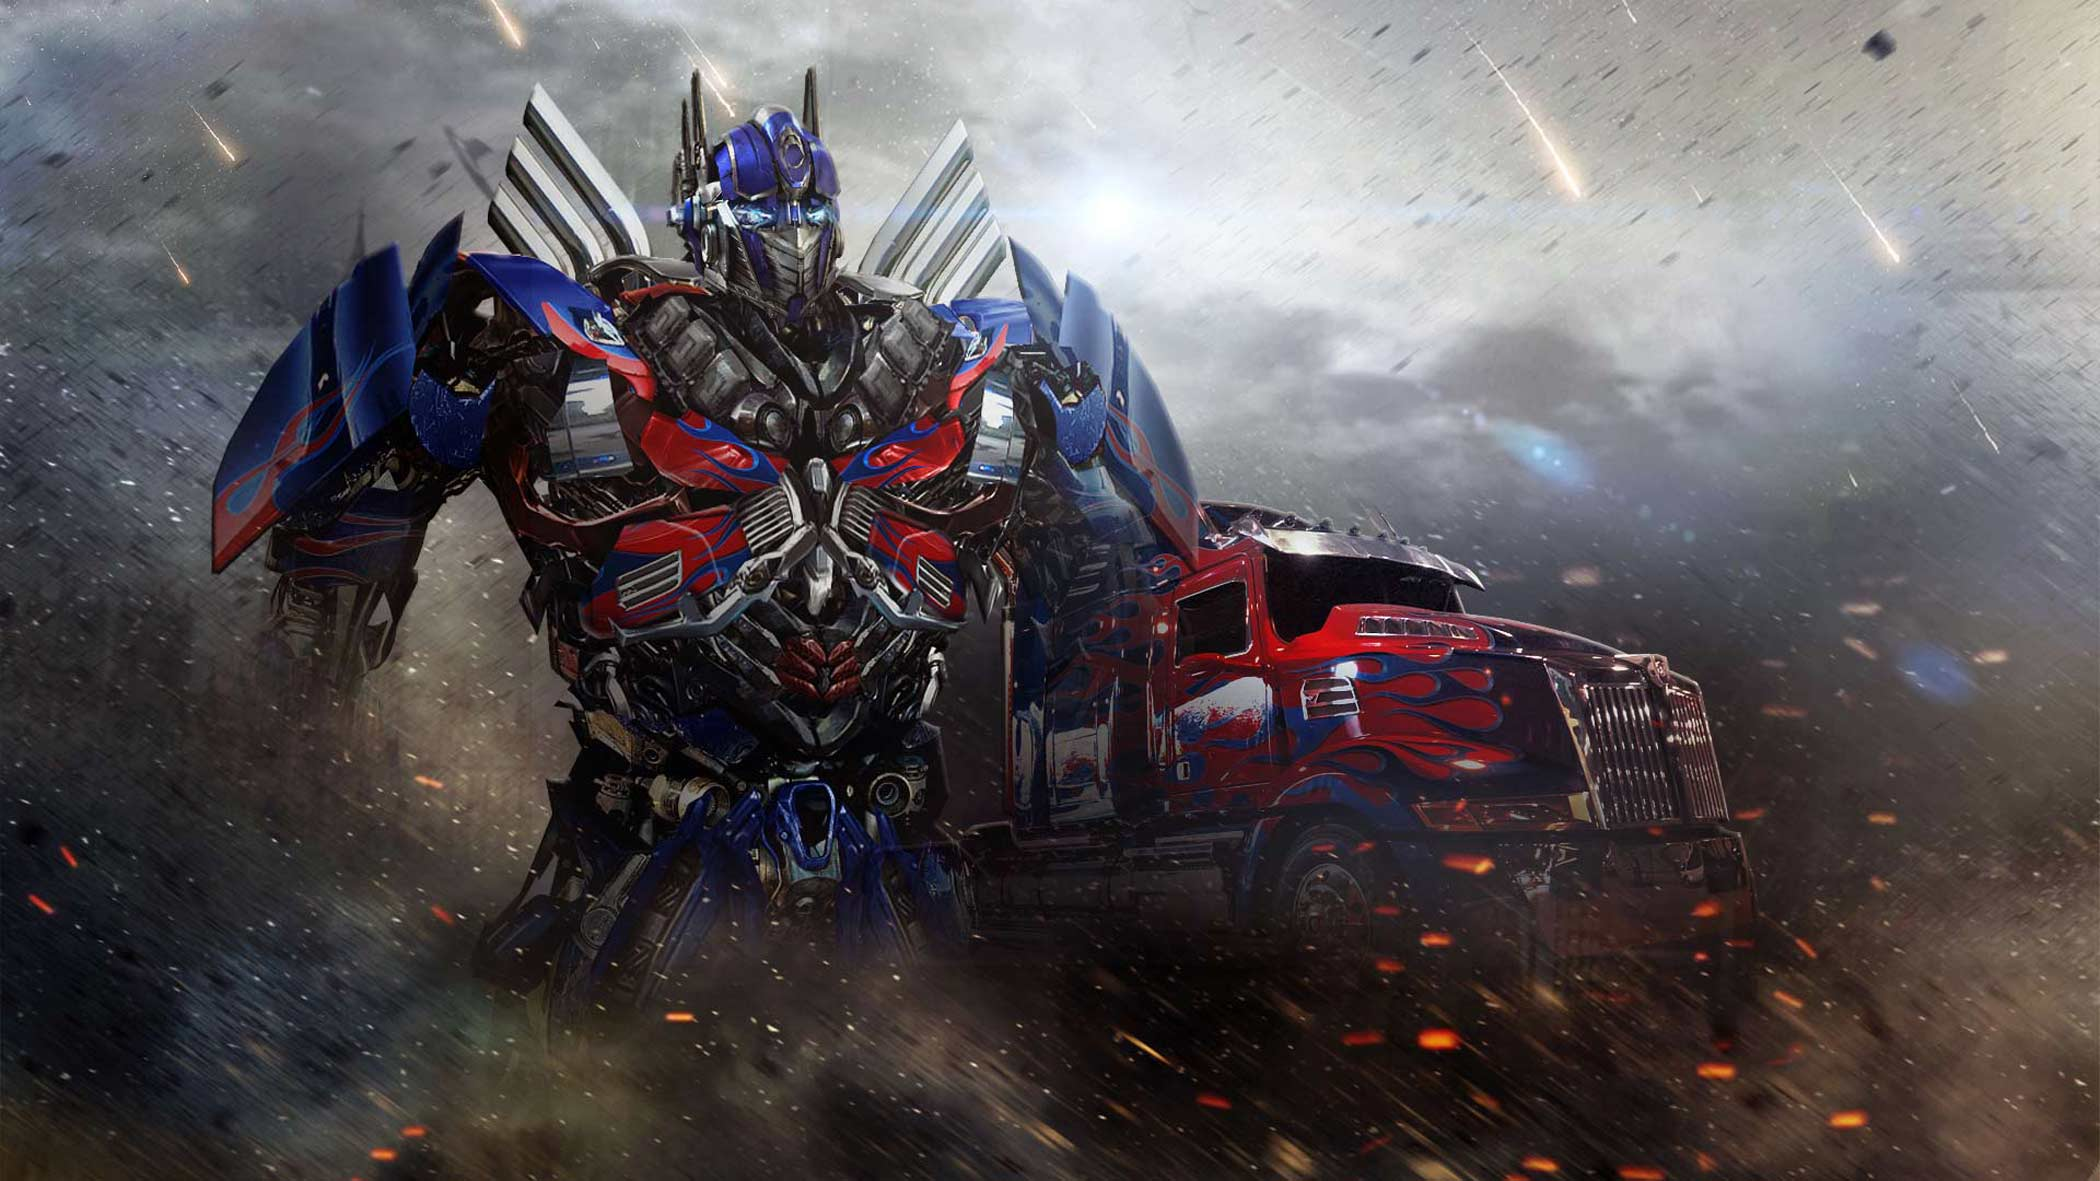 4K Ultra HD Transformers Wallpapers Top Free 4K Ultra HD